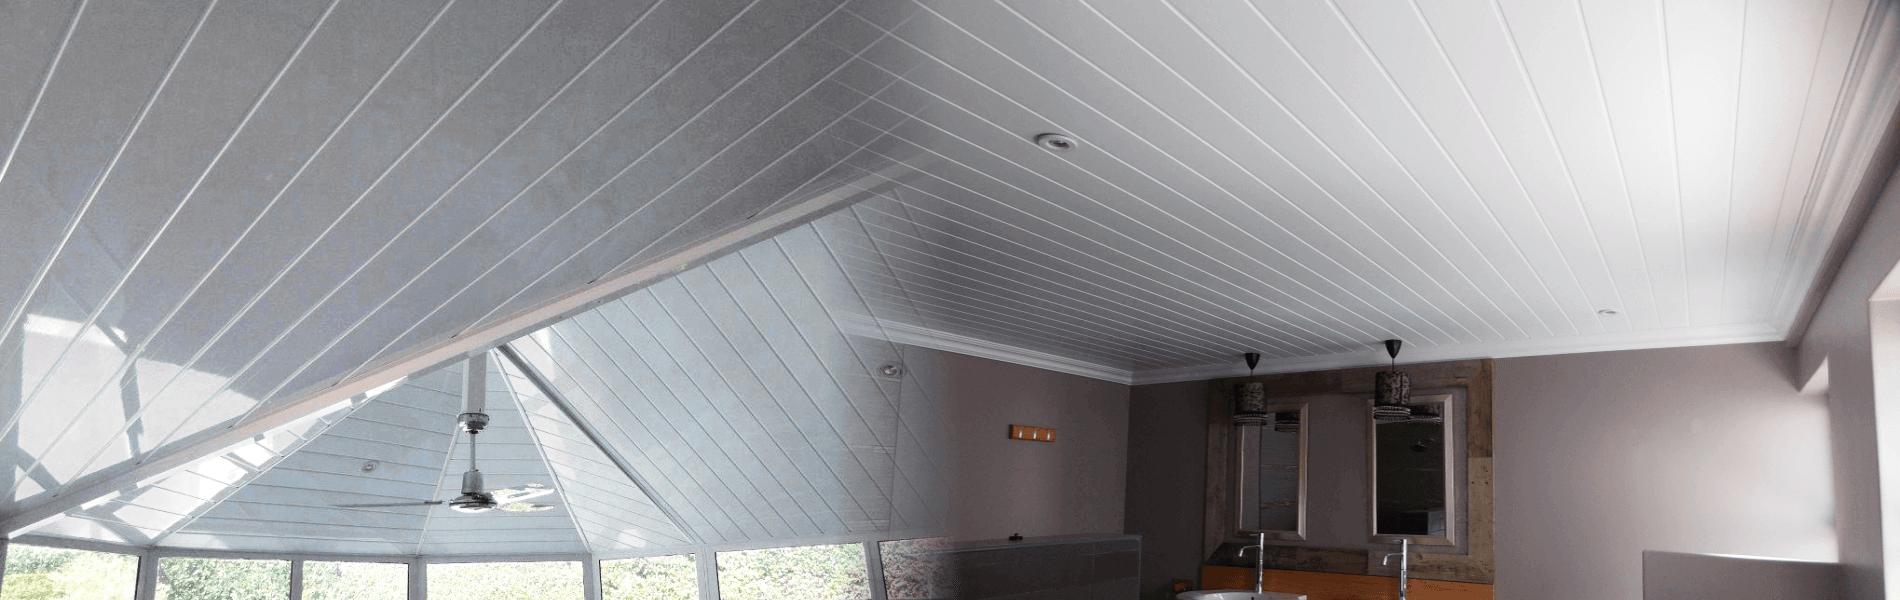 pvc-ceilings-durban-background